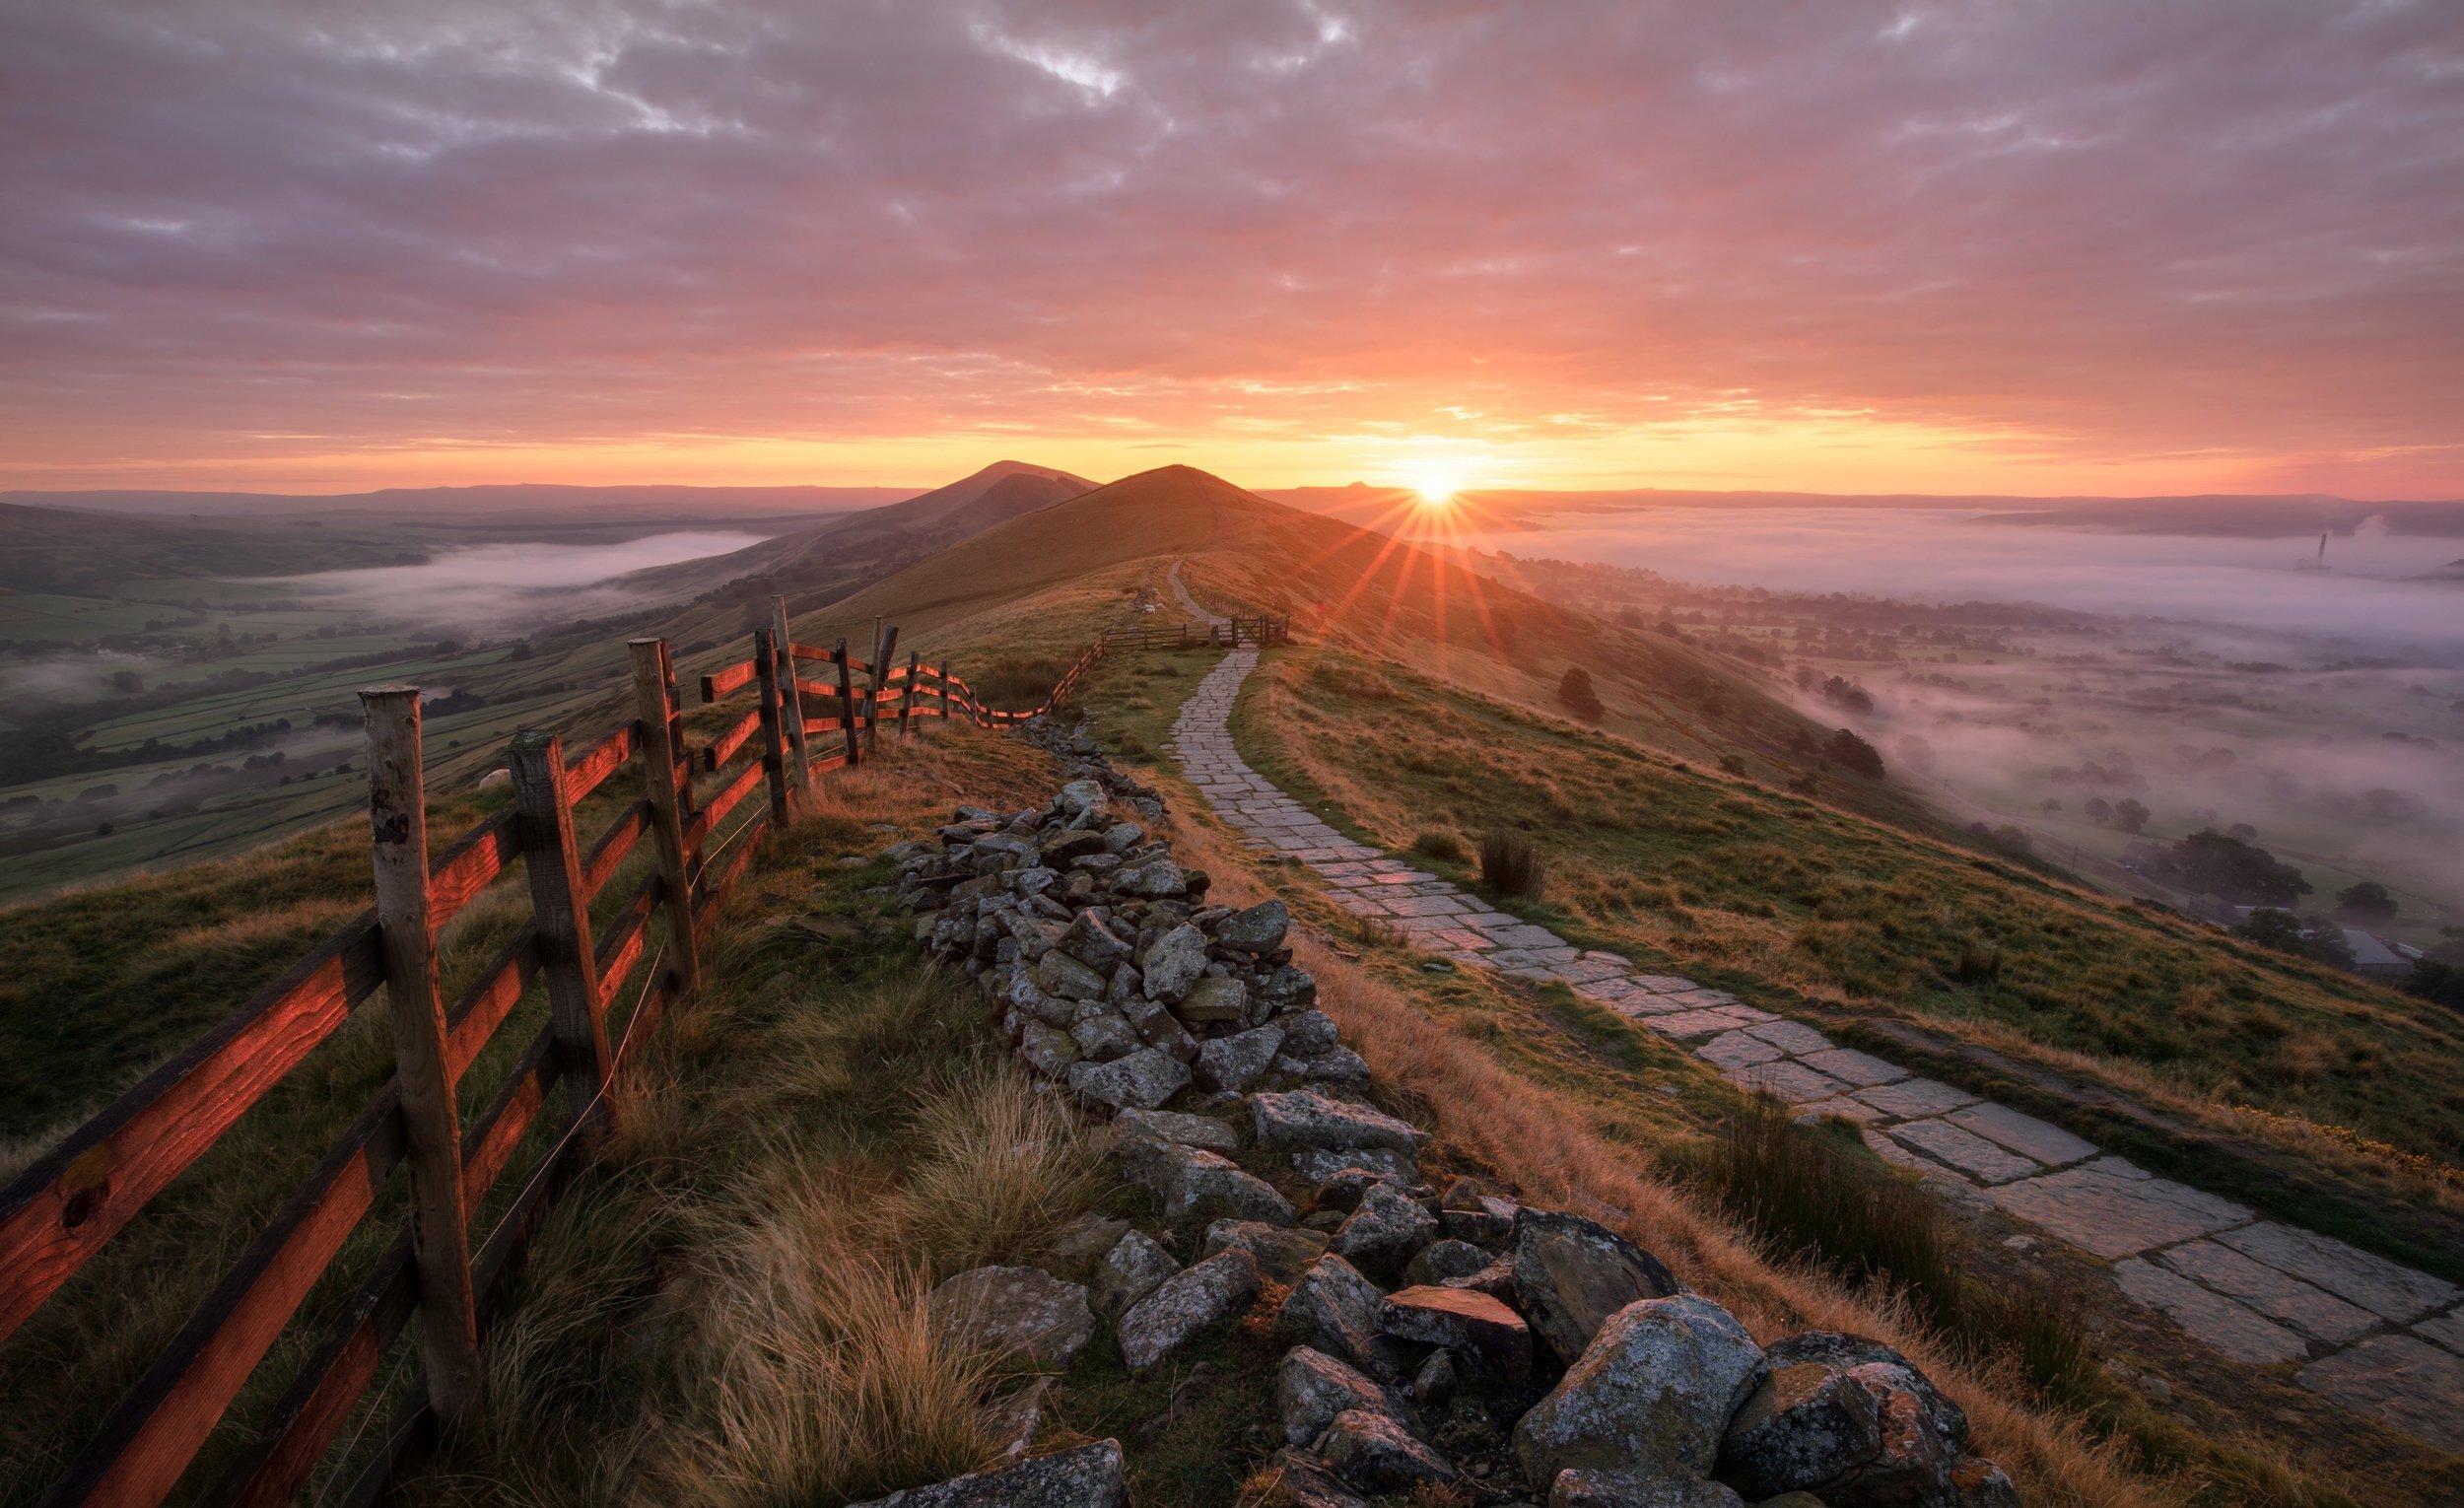 mam-tor-sunrise-1.jpg